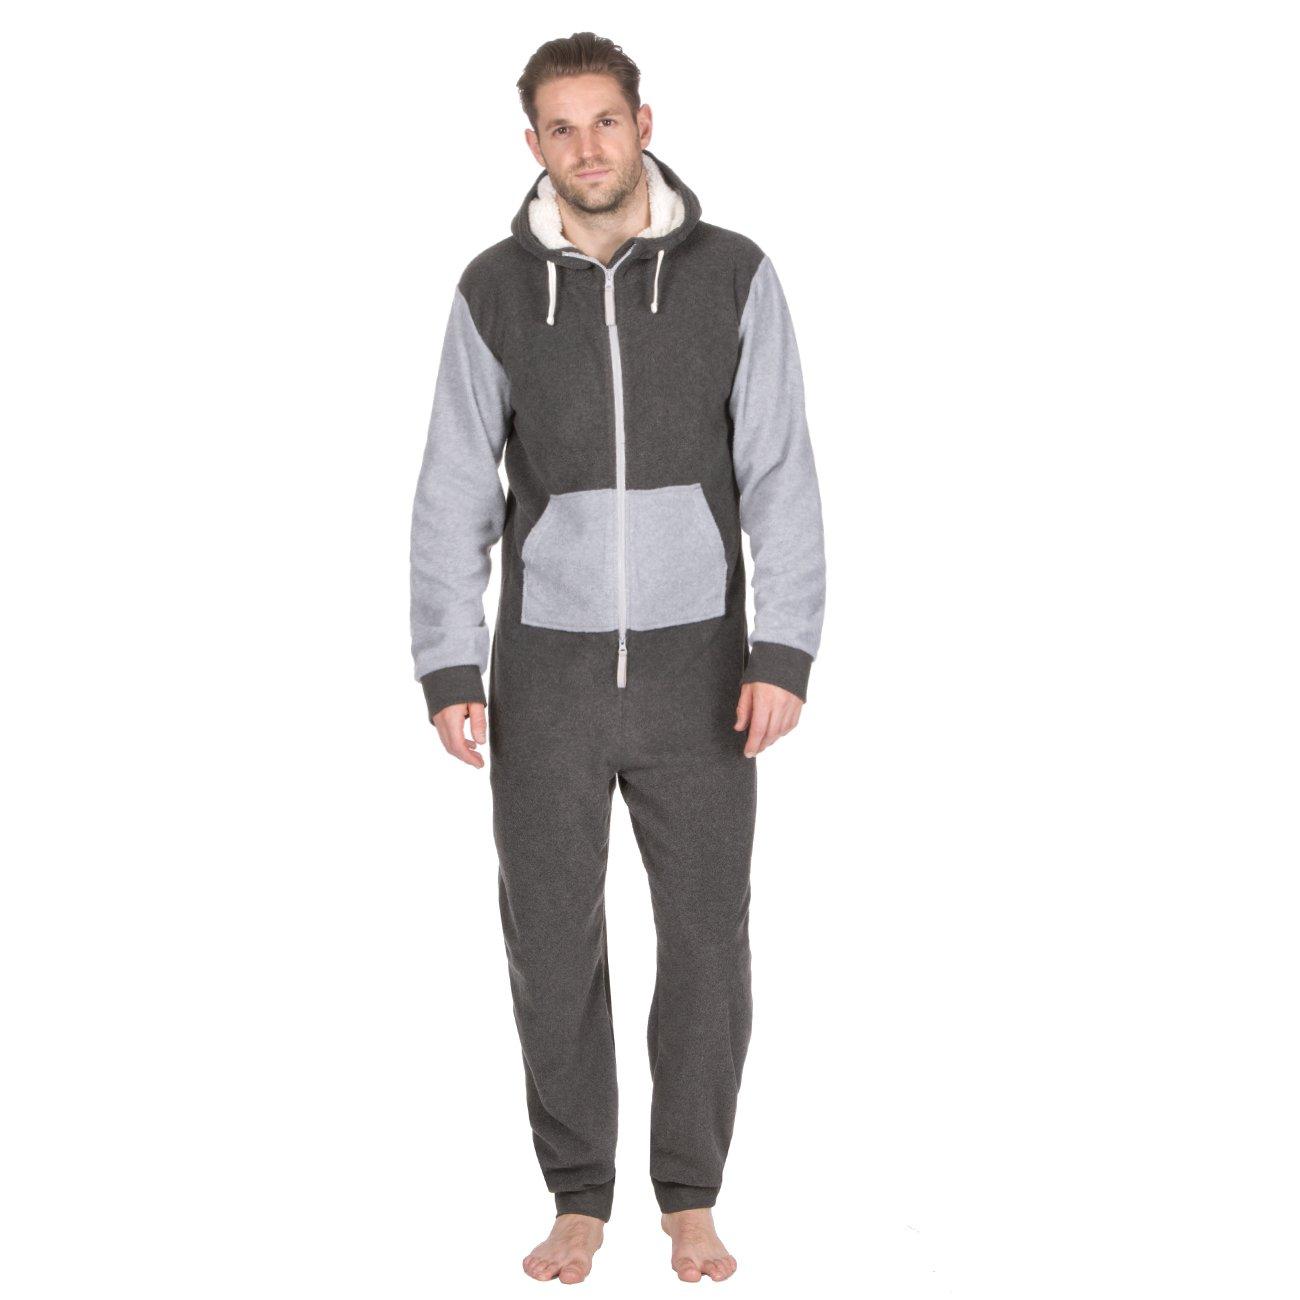 Sudadera micro polar de ONEZEE para hombre con capucha en colores contrastados